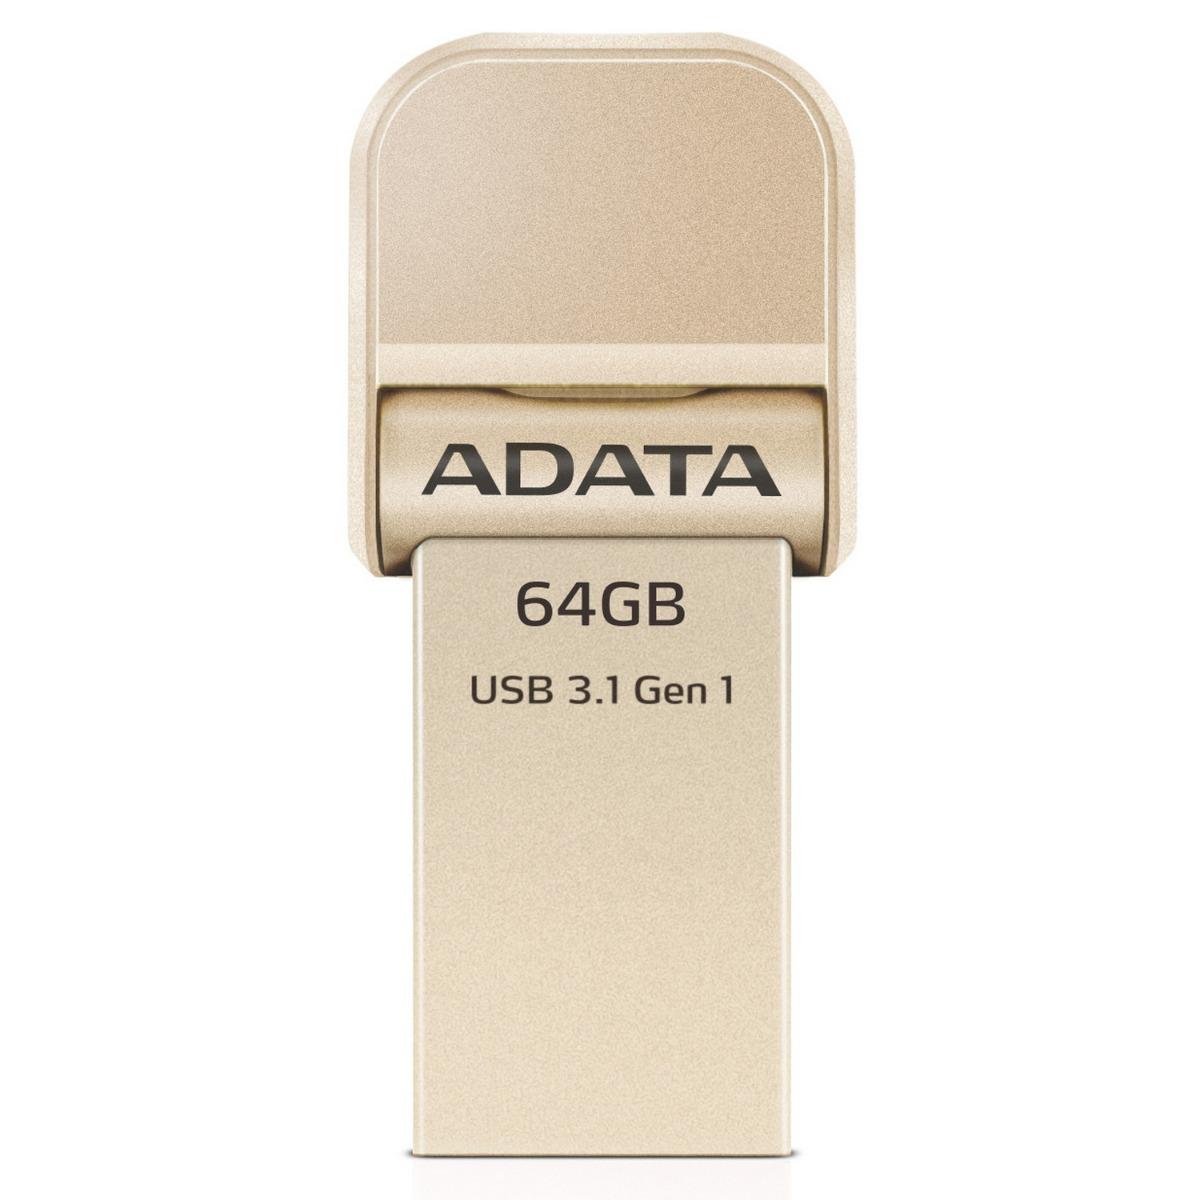 OTG แฟลชไดรฟ์ (64GB) รุ่น AI920 AAI920-64G-CGD